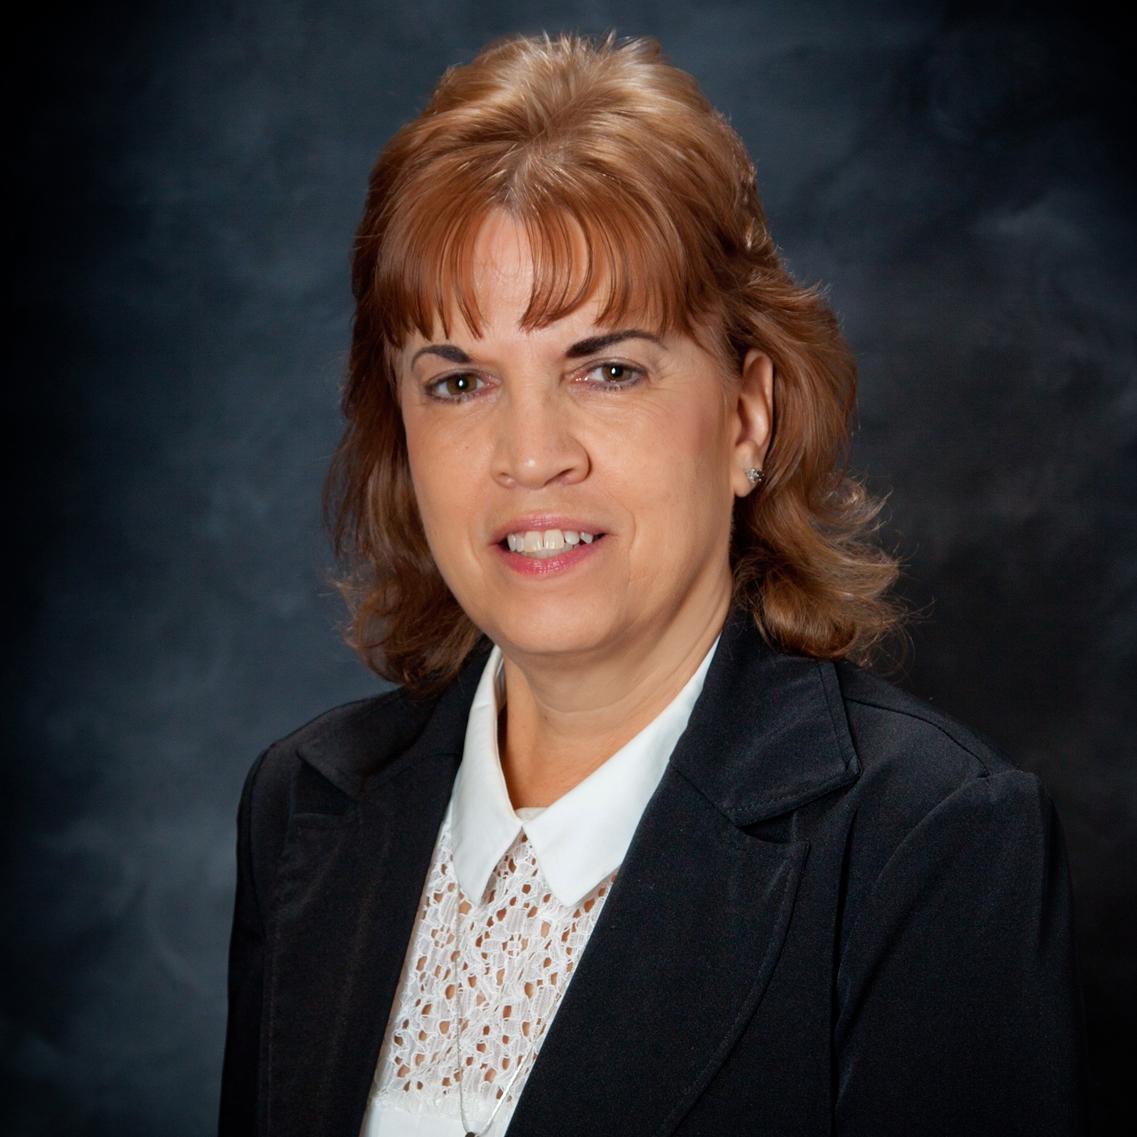 Susan L. Black